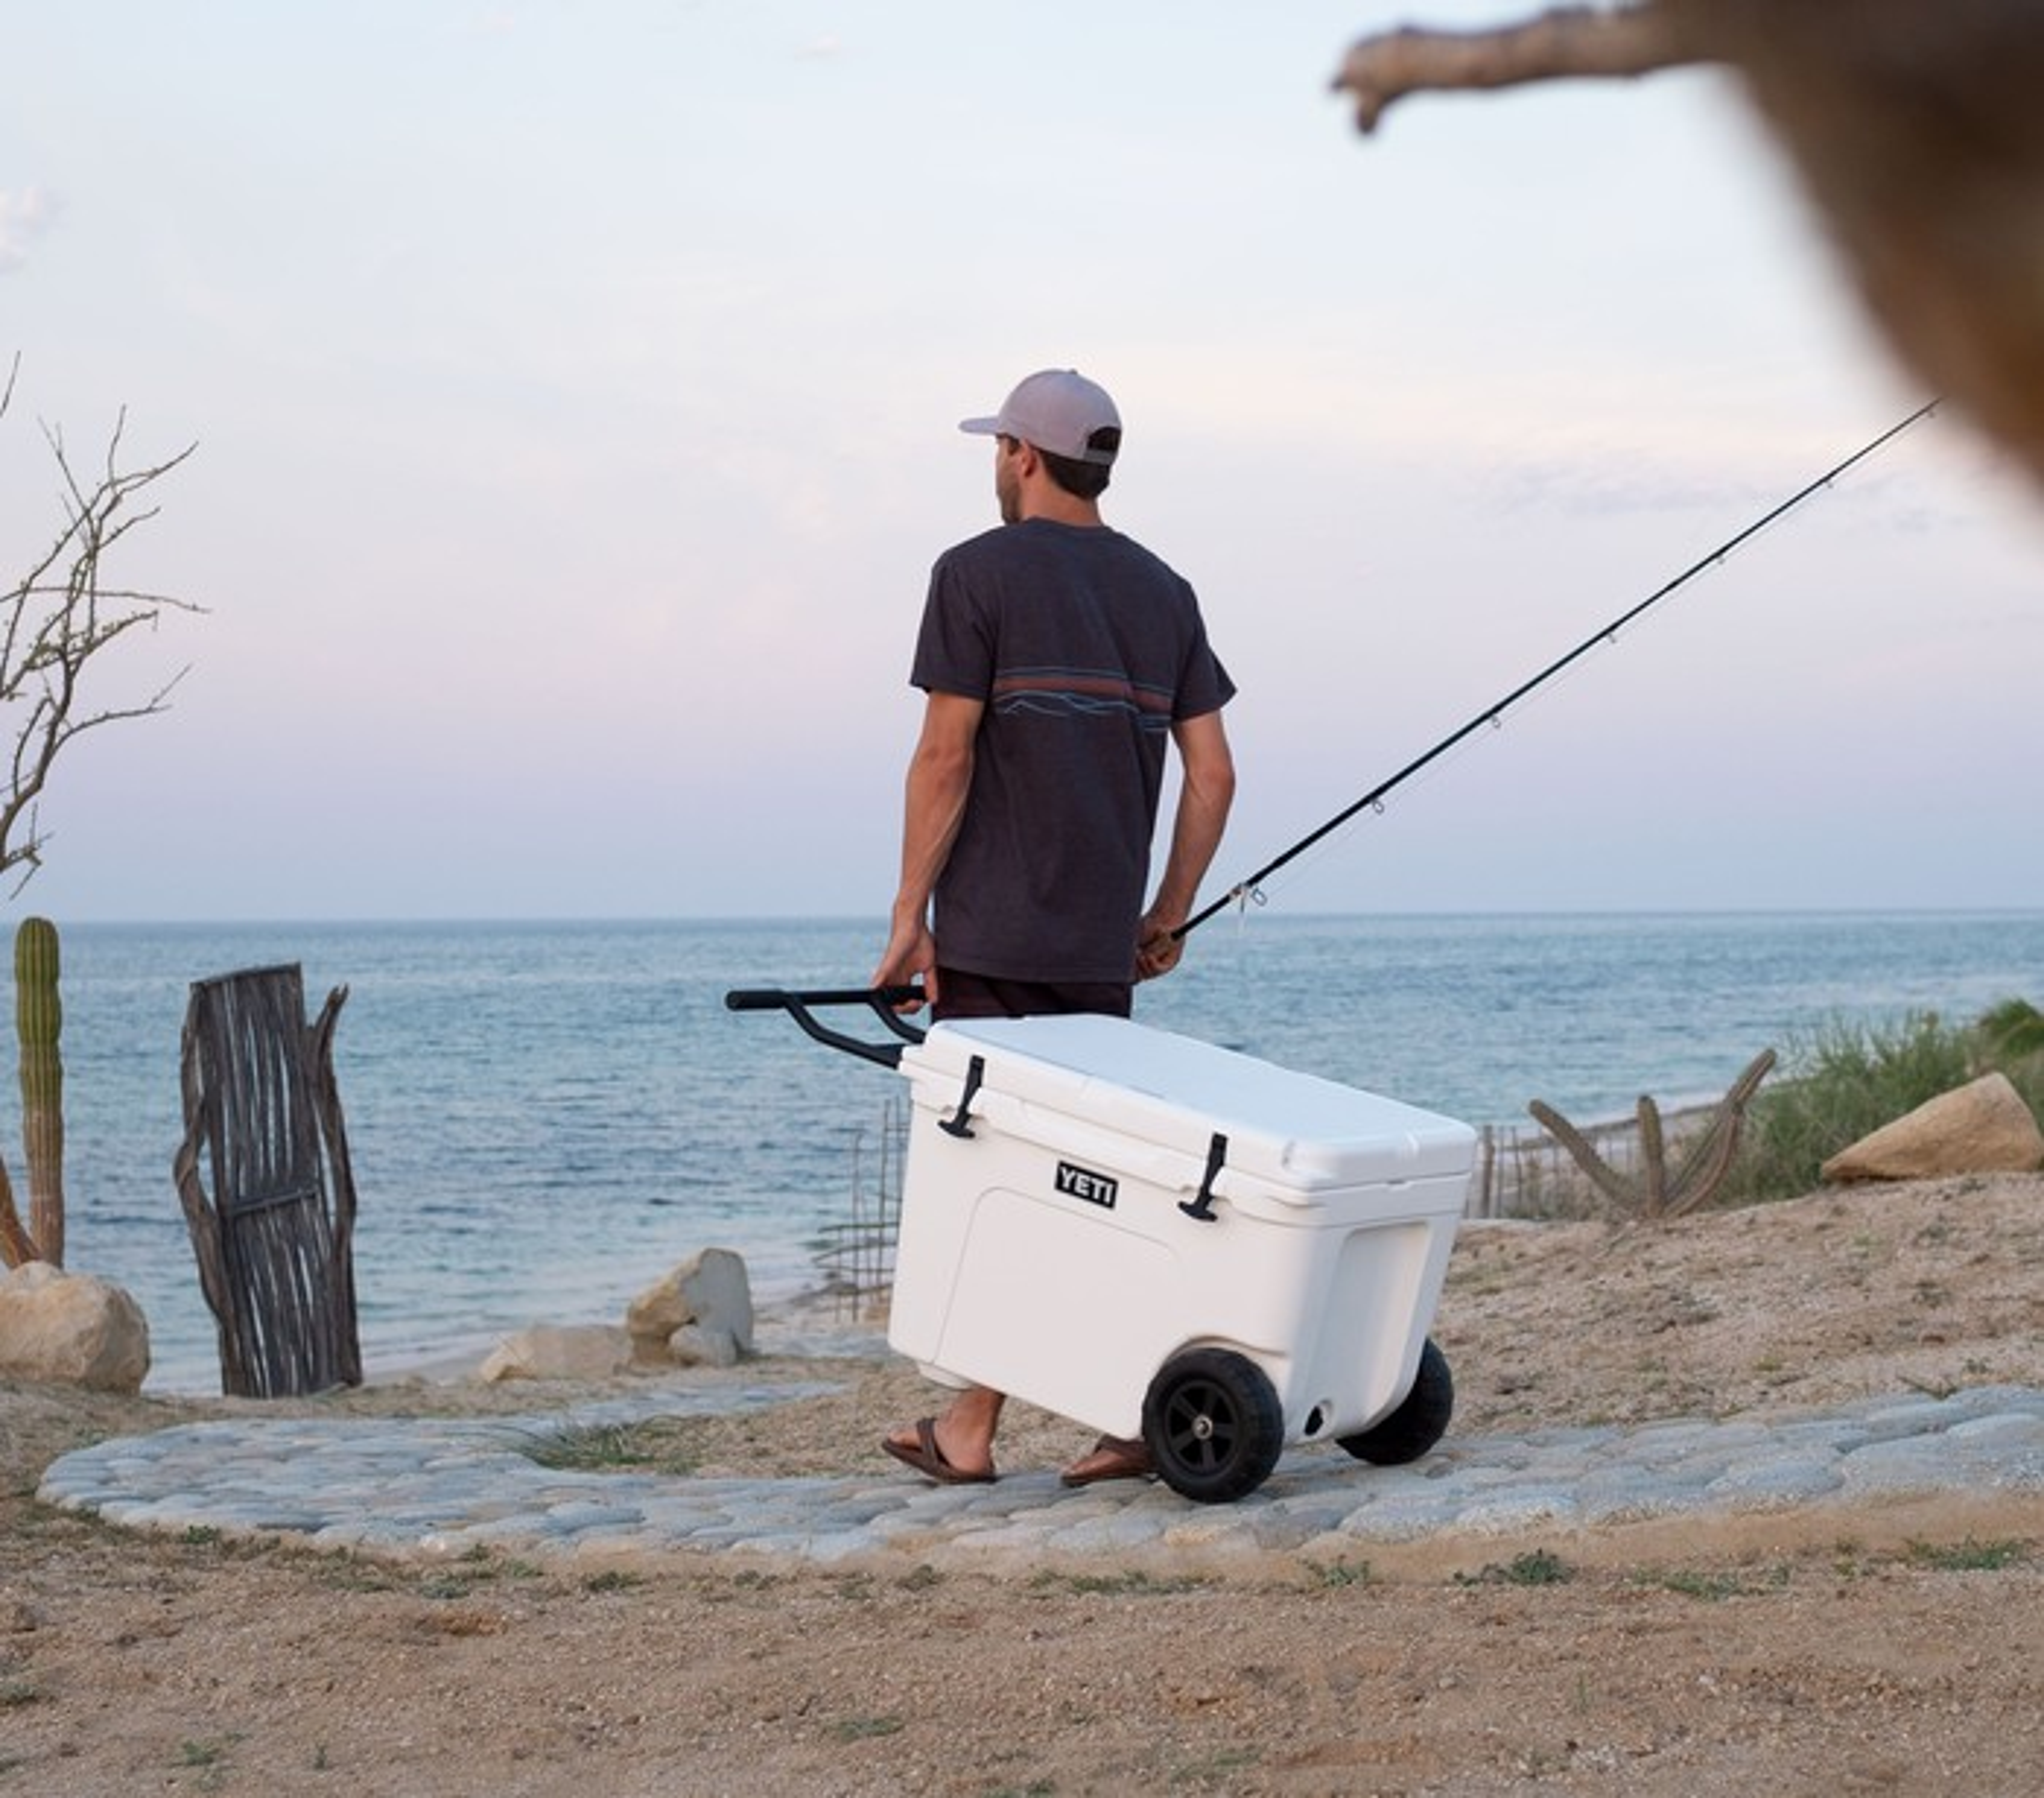 Man pulling Yeti cooler towards beach